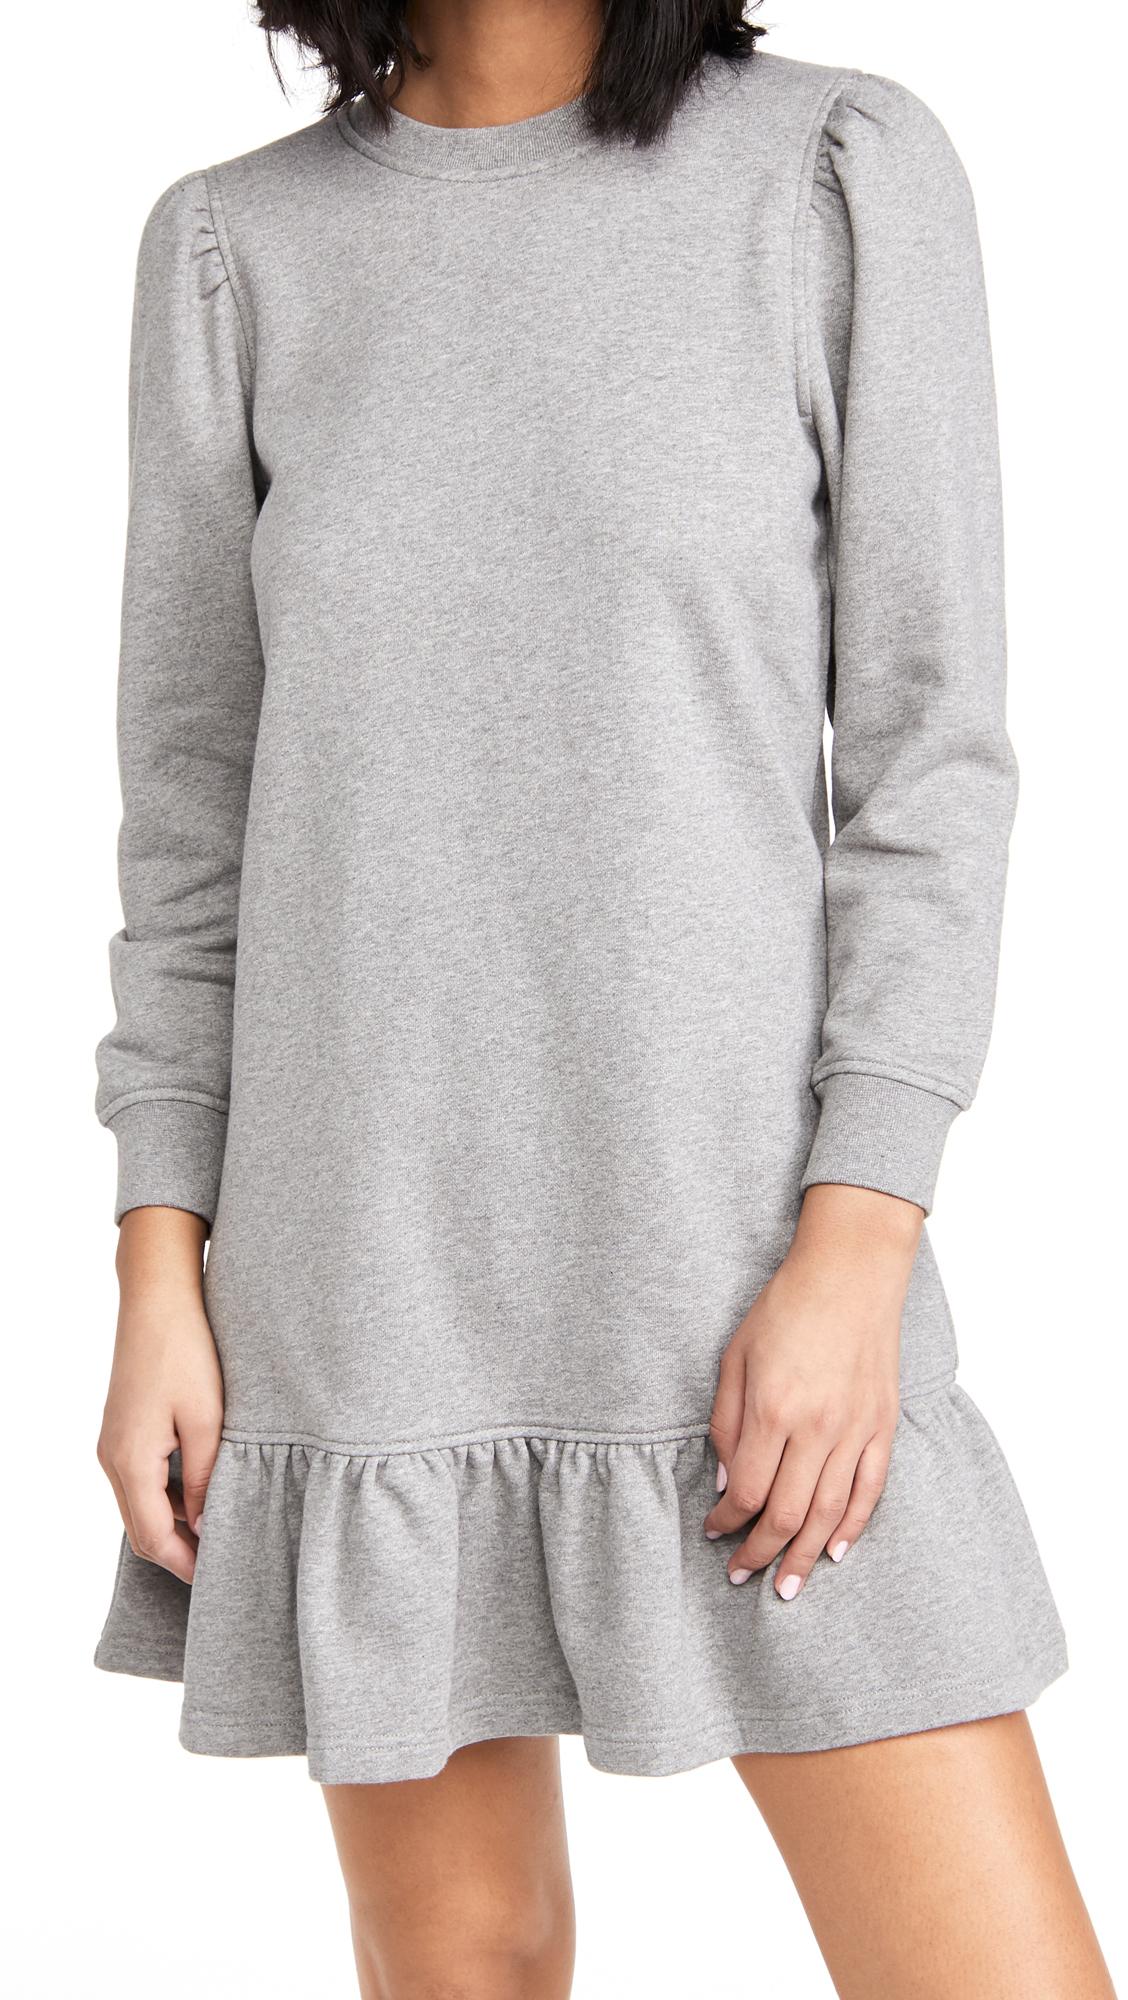 Derek Lam 10 Crosby Caden Sweatshirt Dress With Ruffle Hem